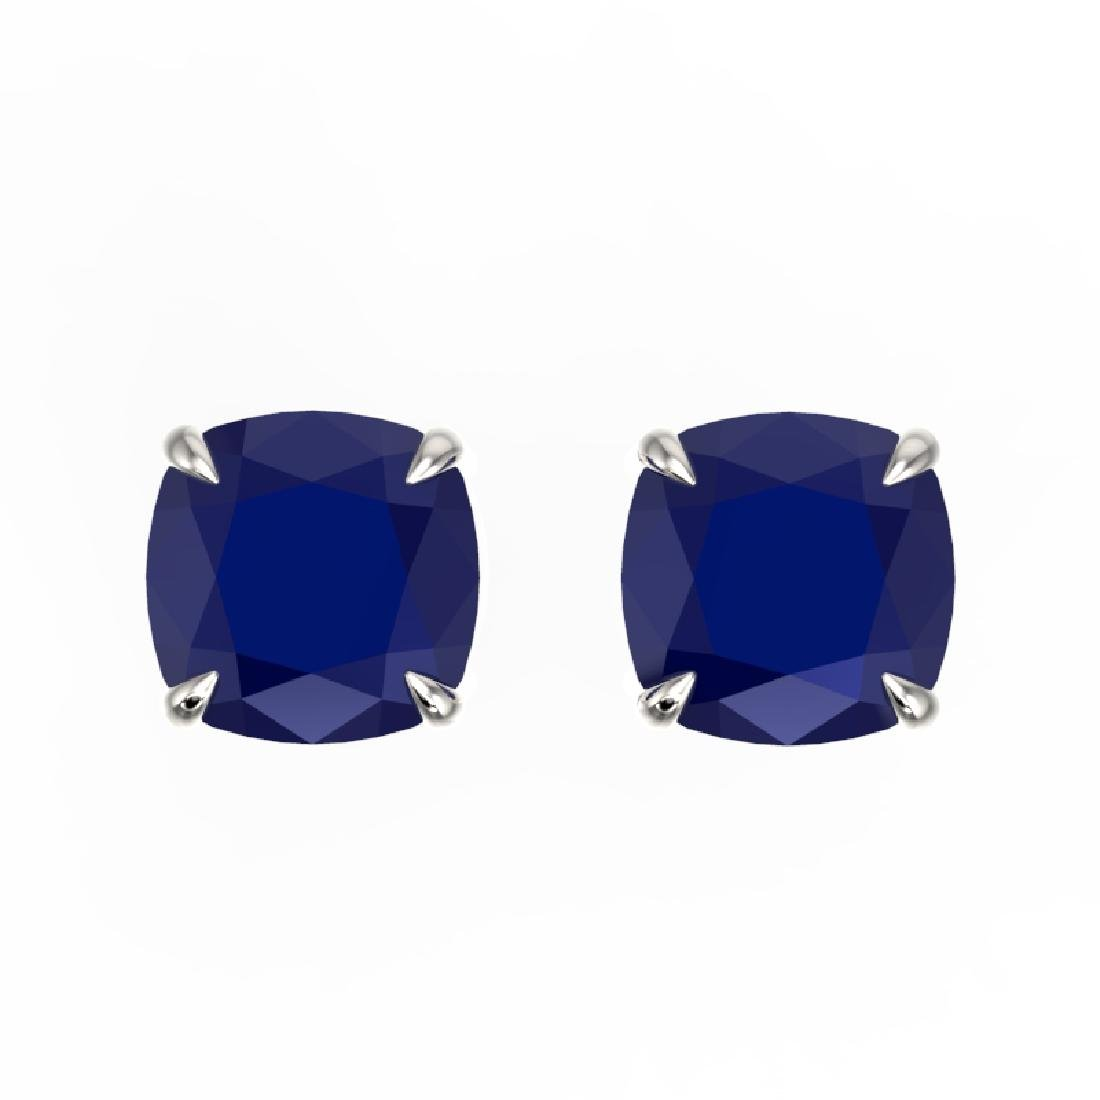 4 CTW Cushion Cut Sapphire Designer Solitaire Stud